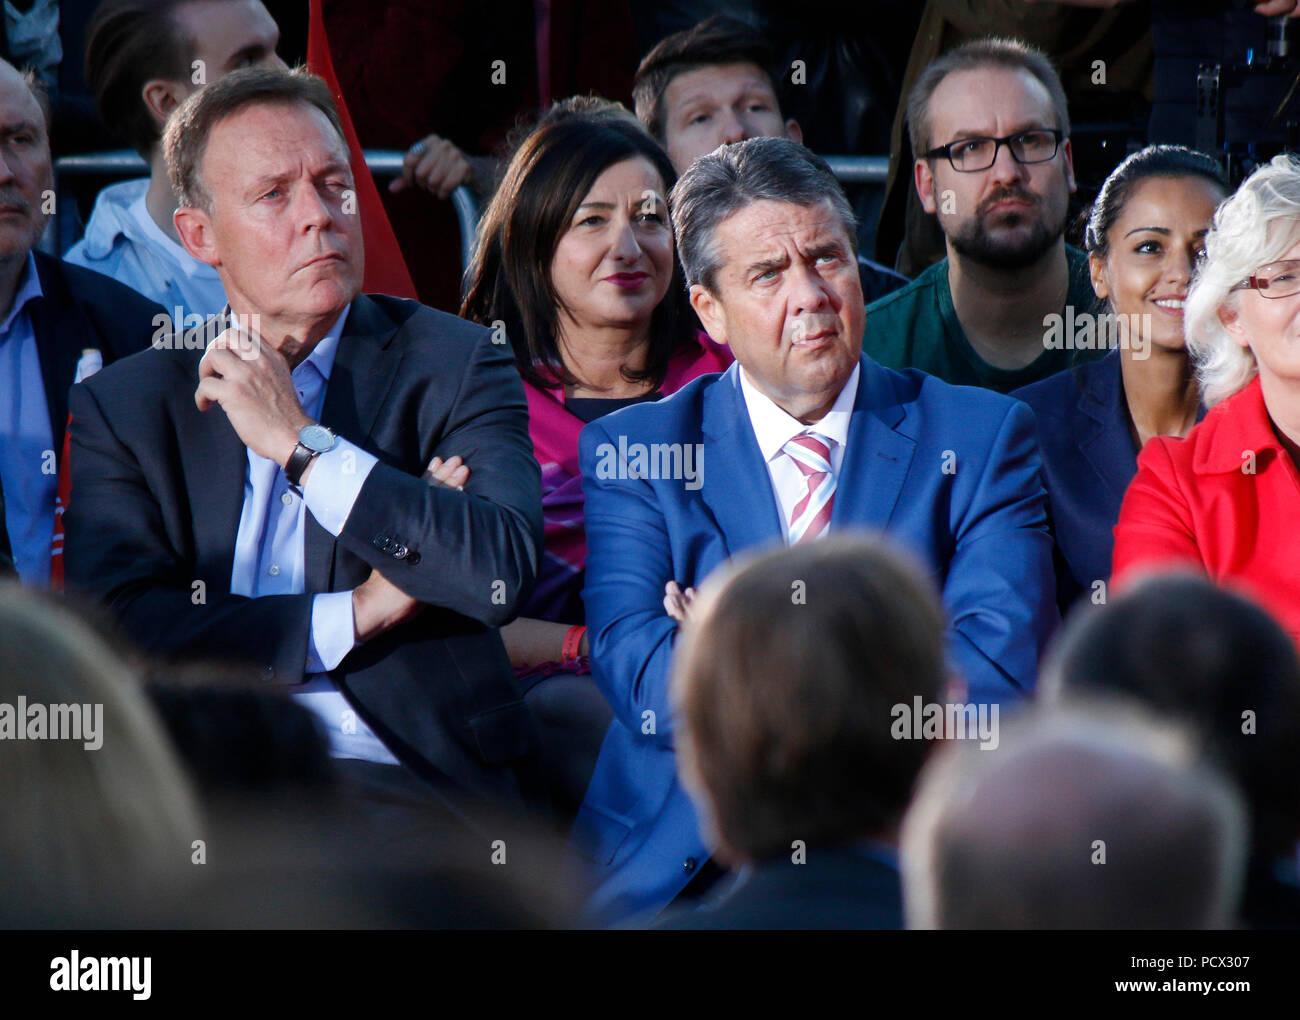 Thomas Oppermann, Sigmar Gabriel u.a. - Wahlkampfauftritt des Kanzlerkandidaten der SPD, Gendarmenmarkt, 12. September 2017, Berlin. - Stock Image